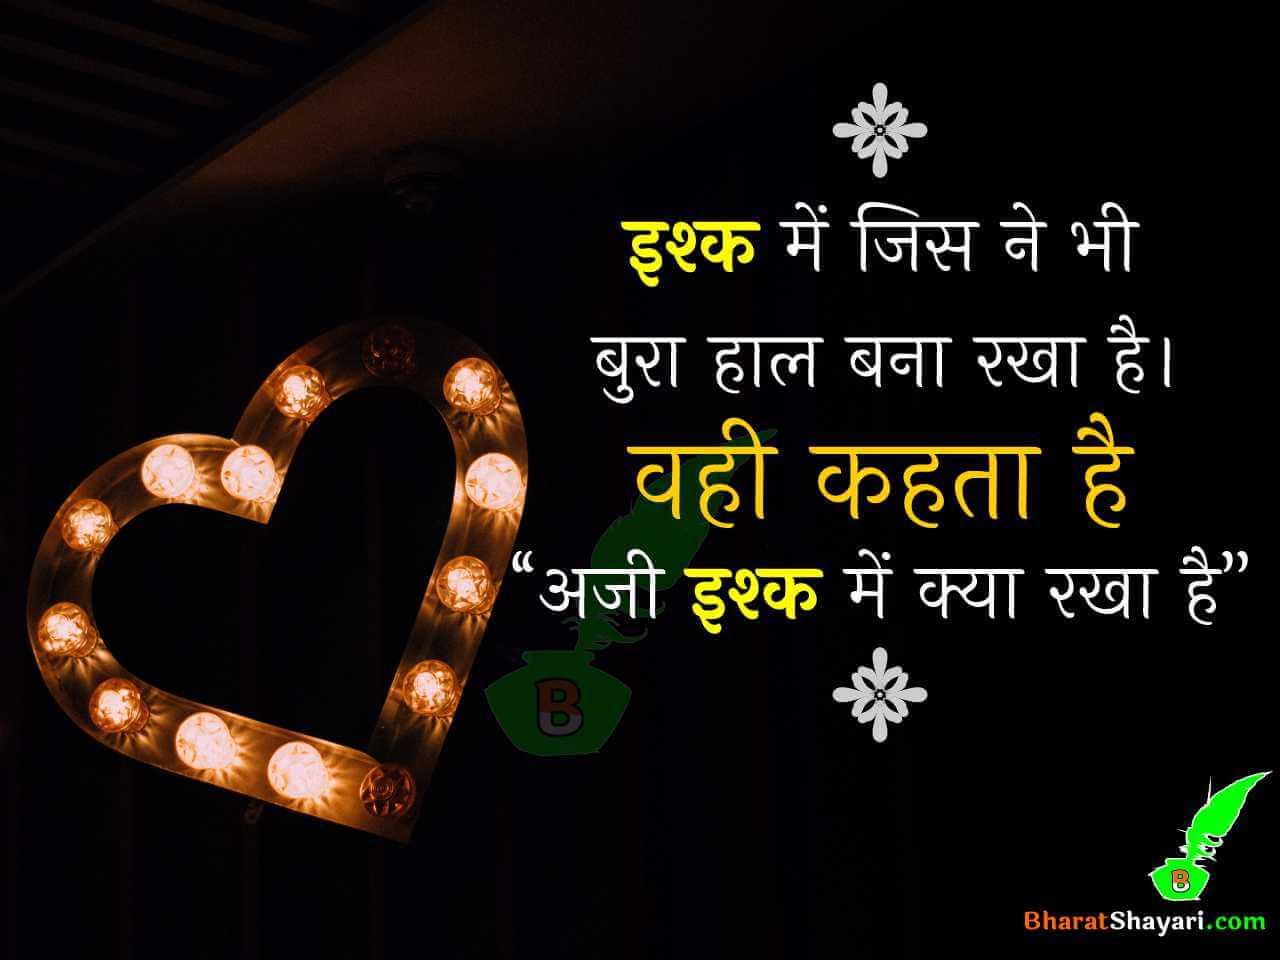 Ishq me jisne bhi bura hal - Love Shayari in Hindi